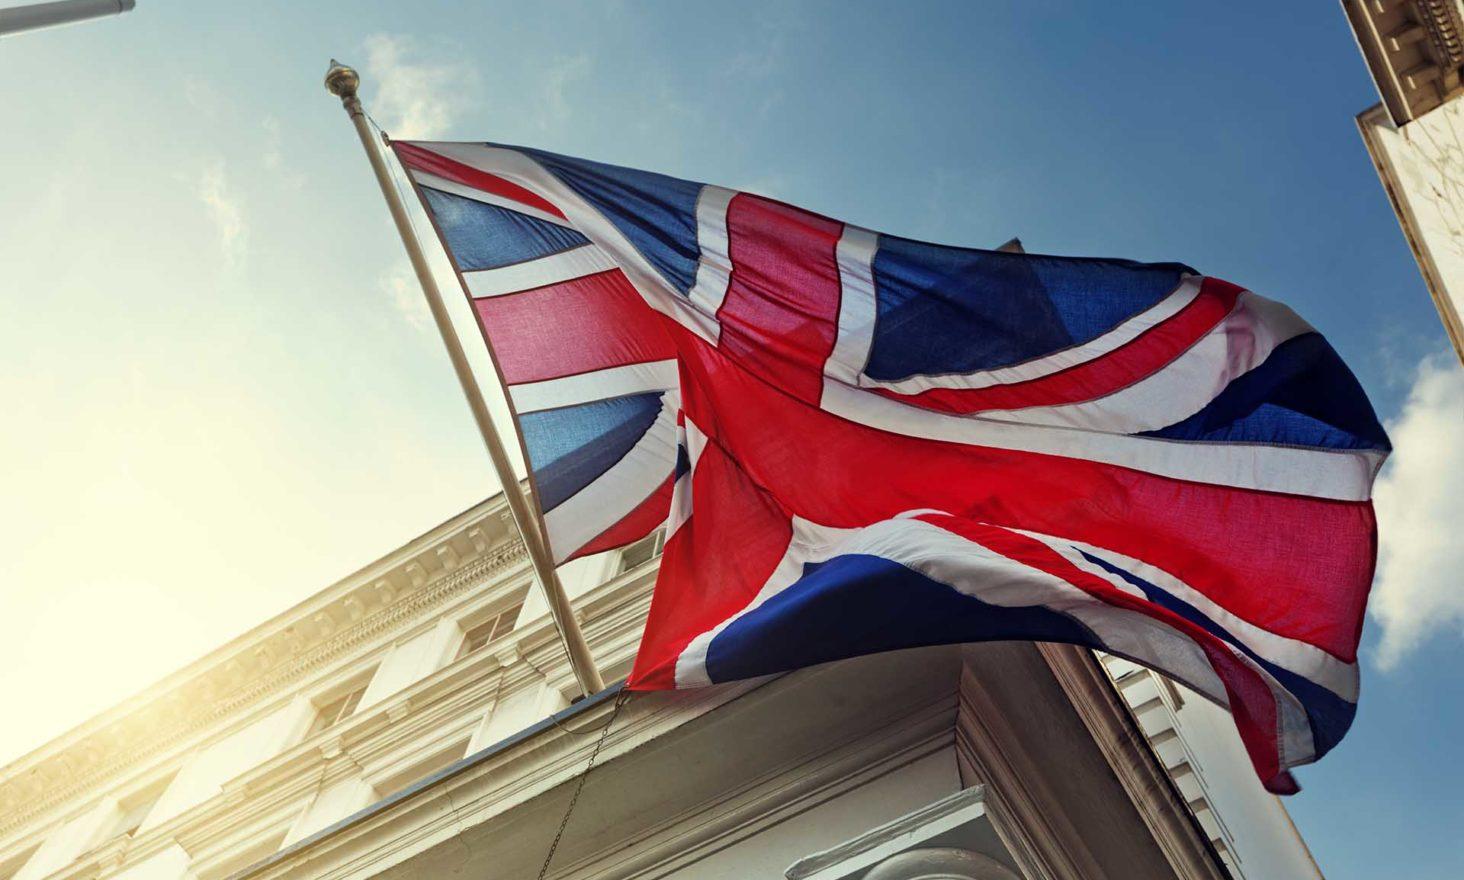 Bitcoin Giants Form Self-Regulatory UK Trade Body